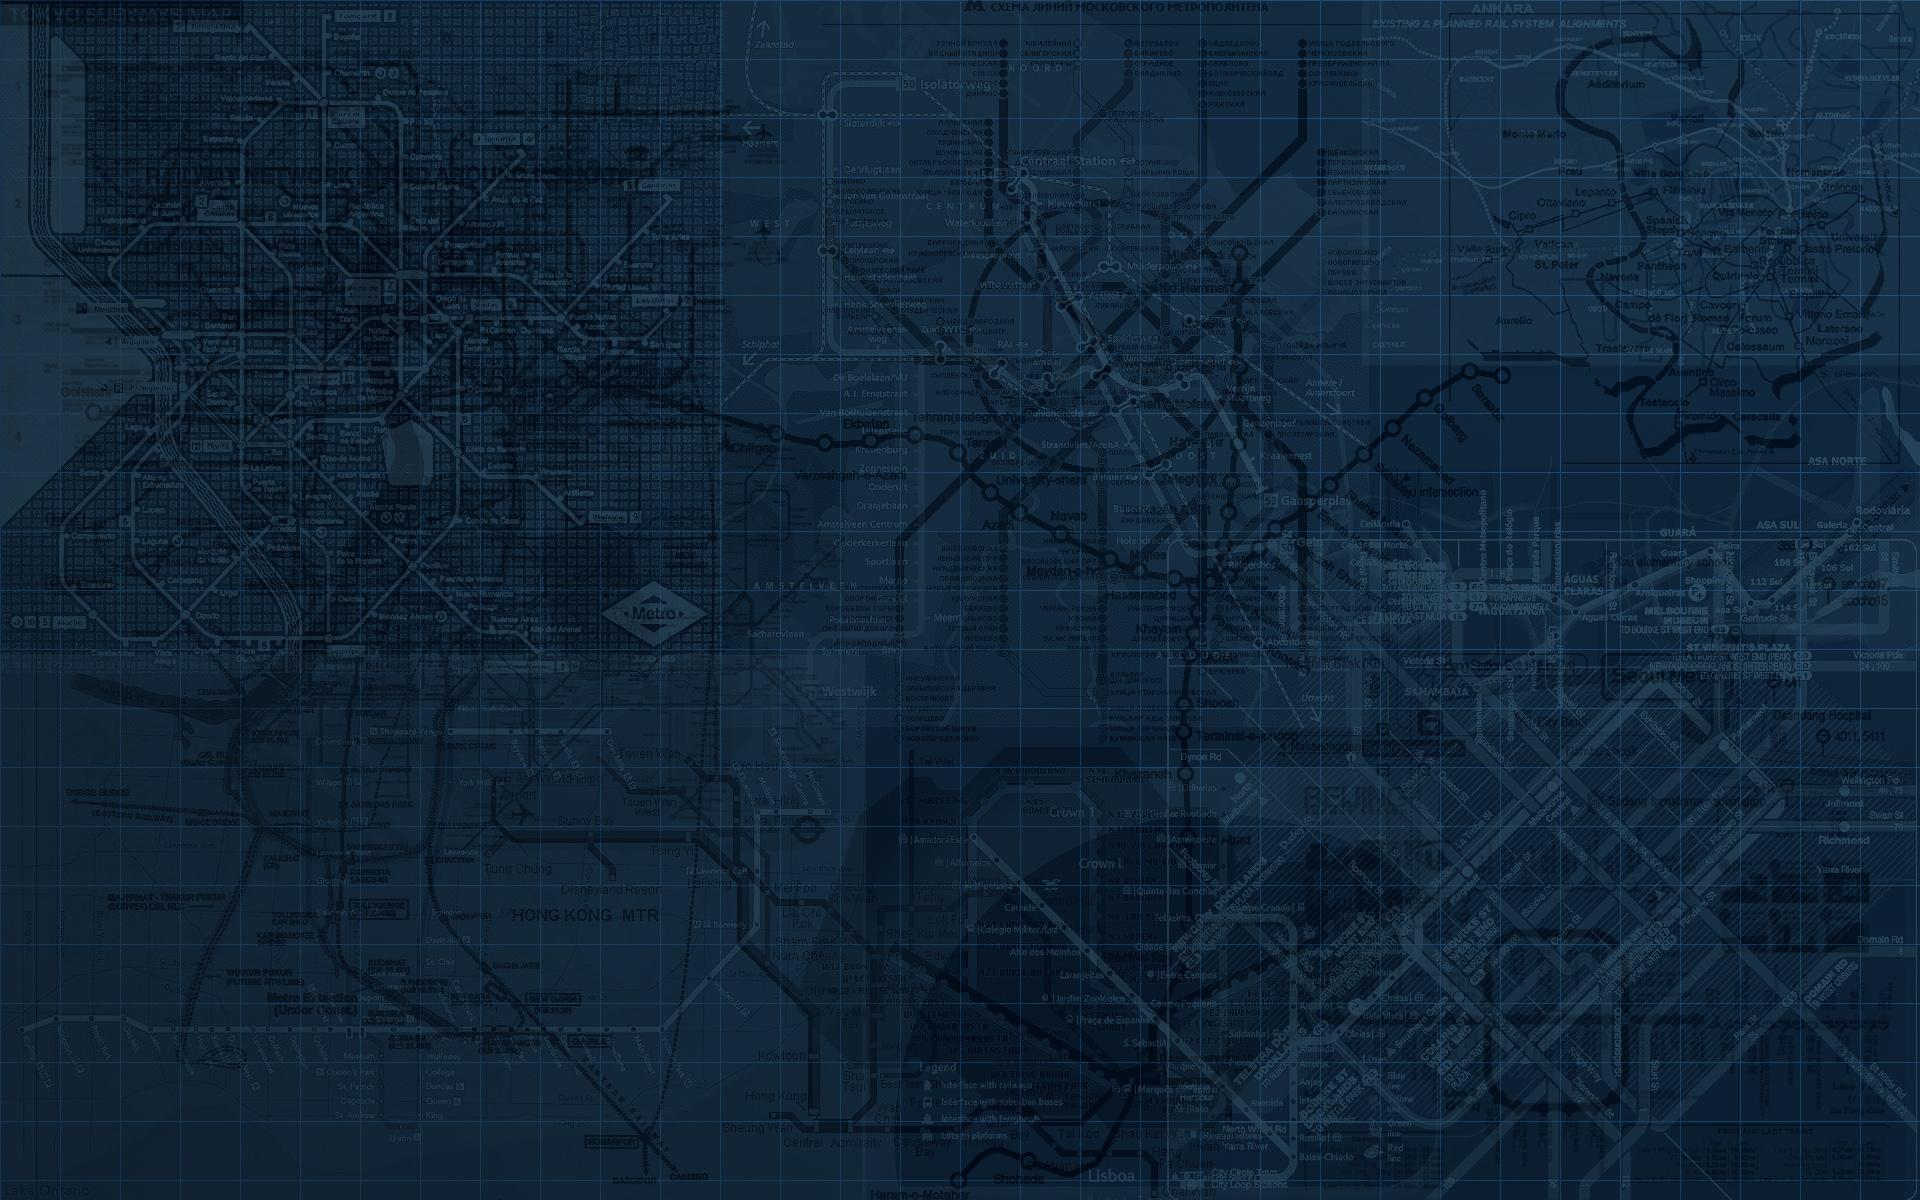 Subway Map Wallpaper By Envirotechture On DeviantArt - Los angeles map wallpaper